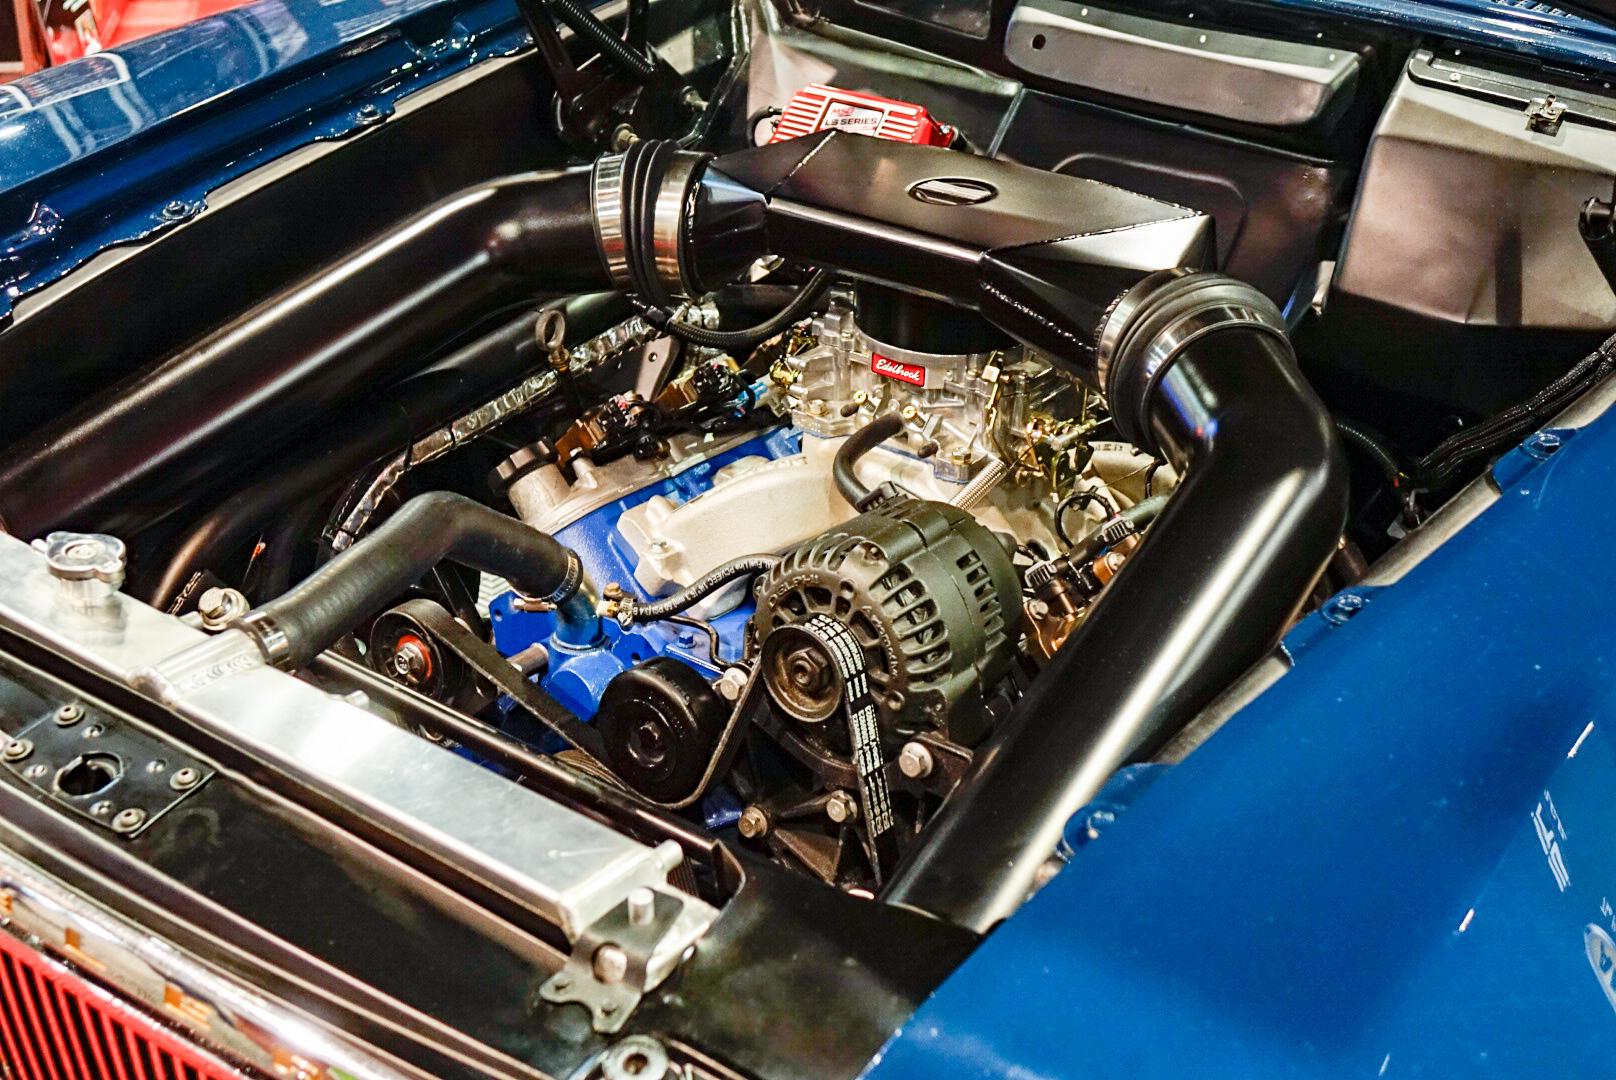 Bauter's 1963 wide-body AMC Rambler American 220 Wagon engine